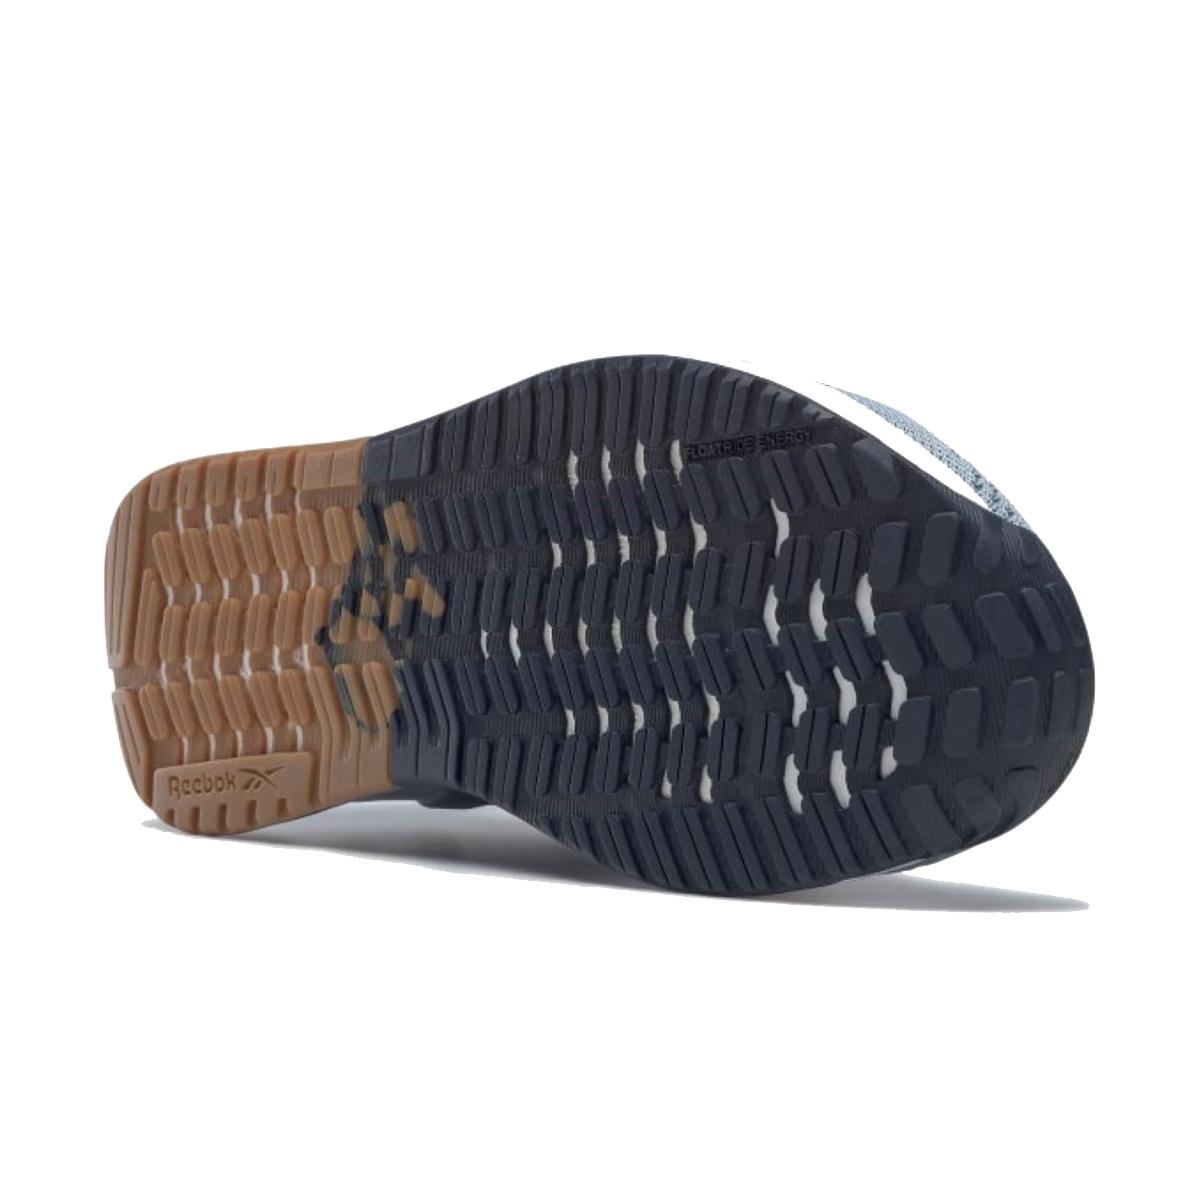 Women's Reebok Nano X1 Training Shoe - Color: Gable Grey/Blue Slate/Vector Navy - Size: 5 - Width: Regular, Gable Grey/Blue Slate/Vector Navy, large, image 4